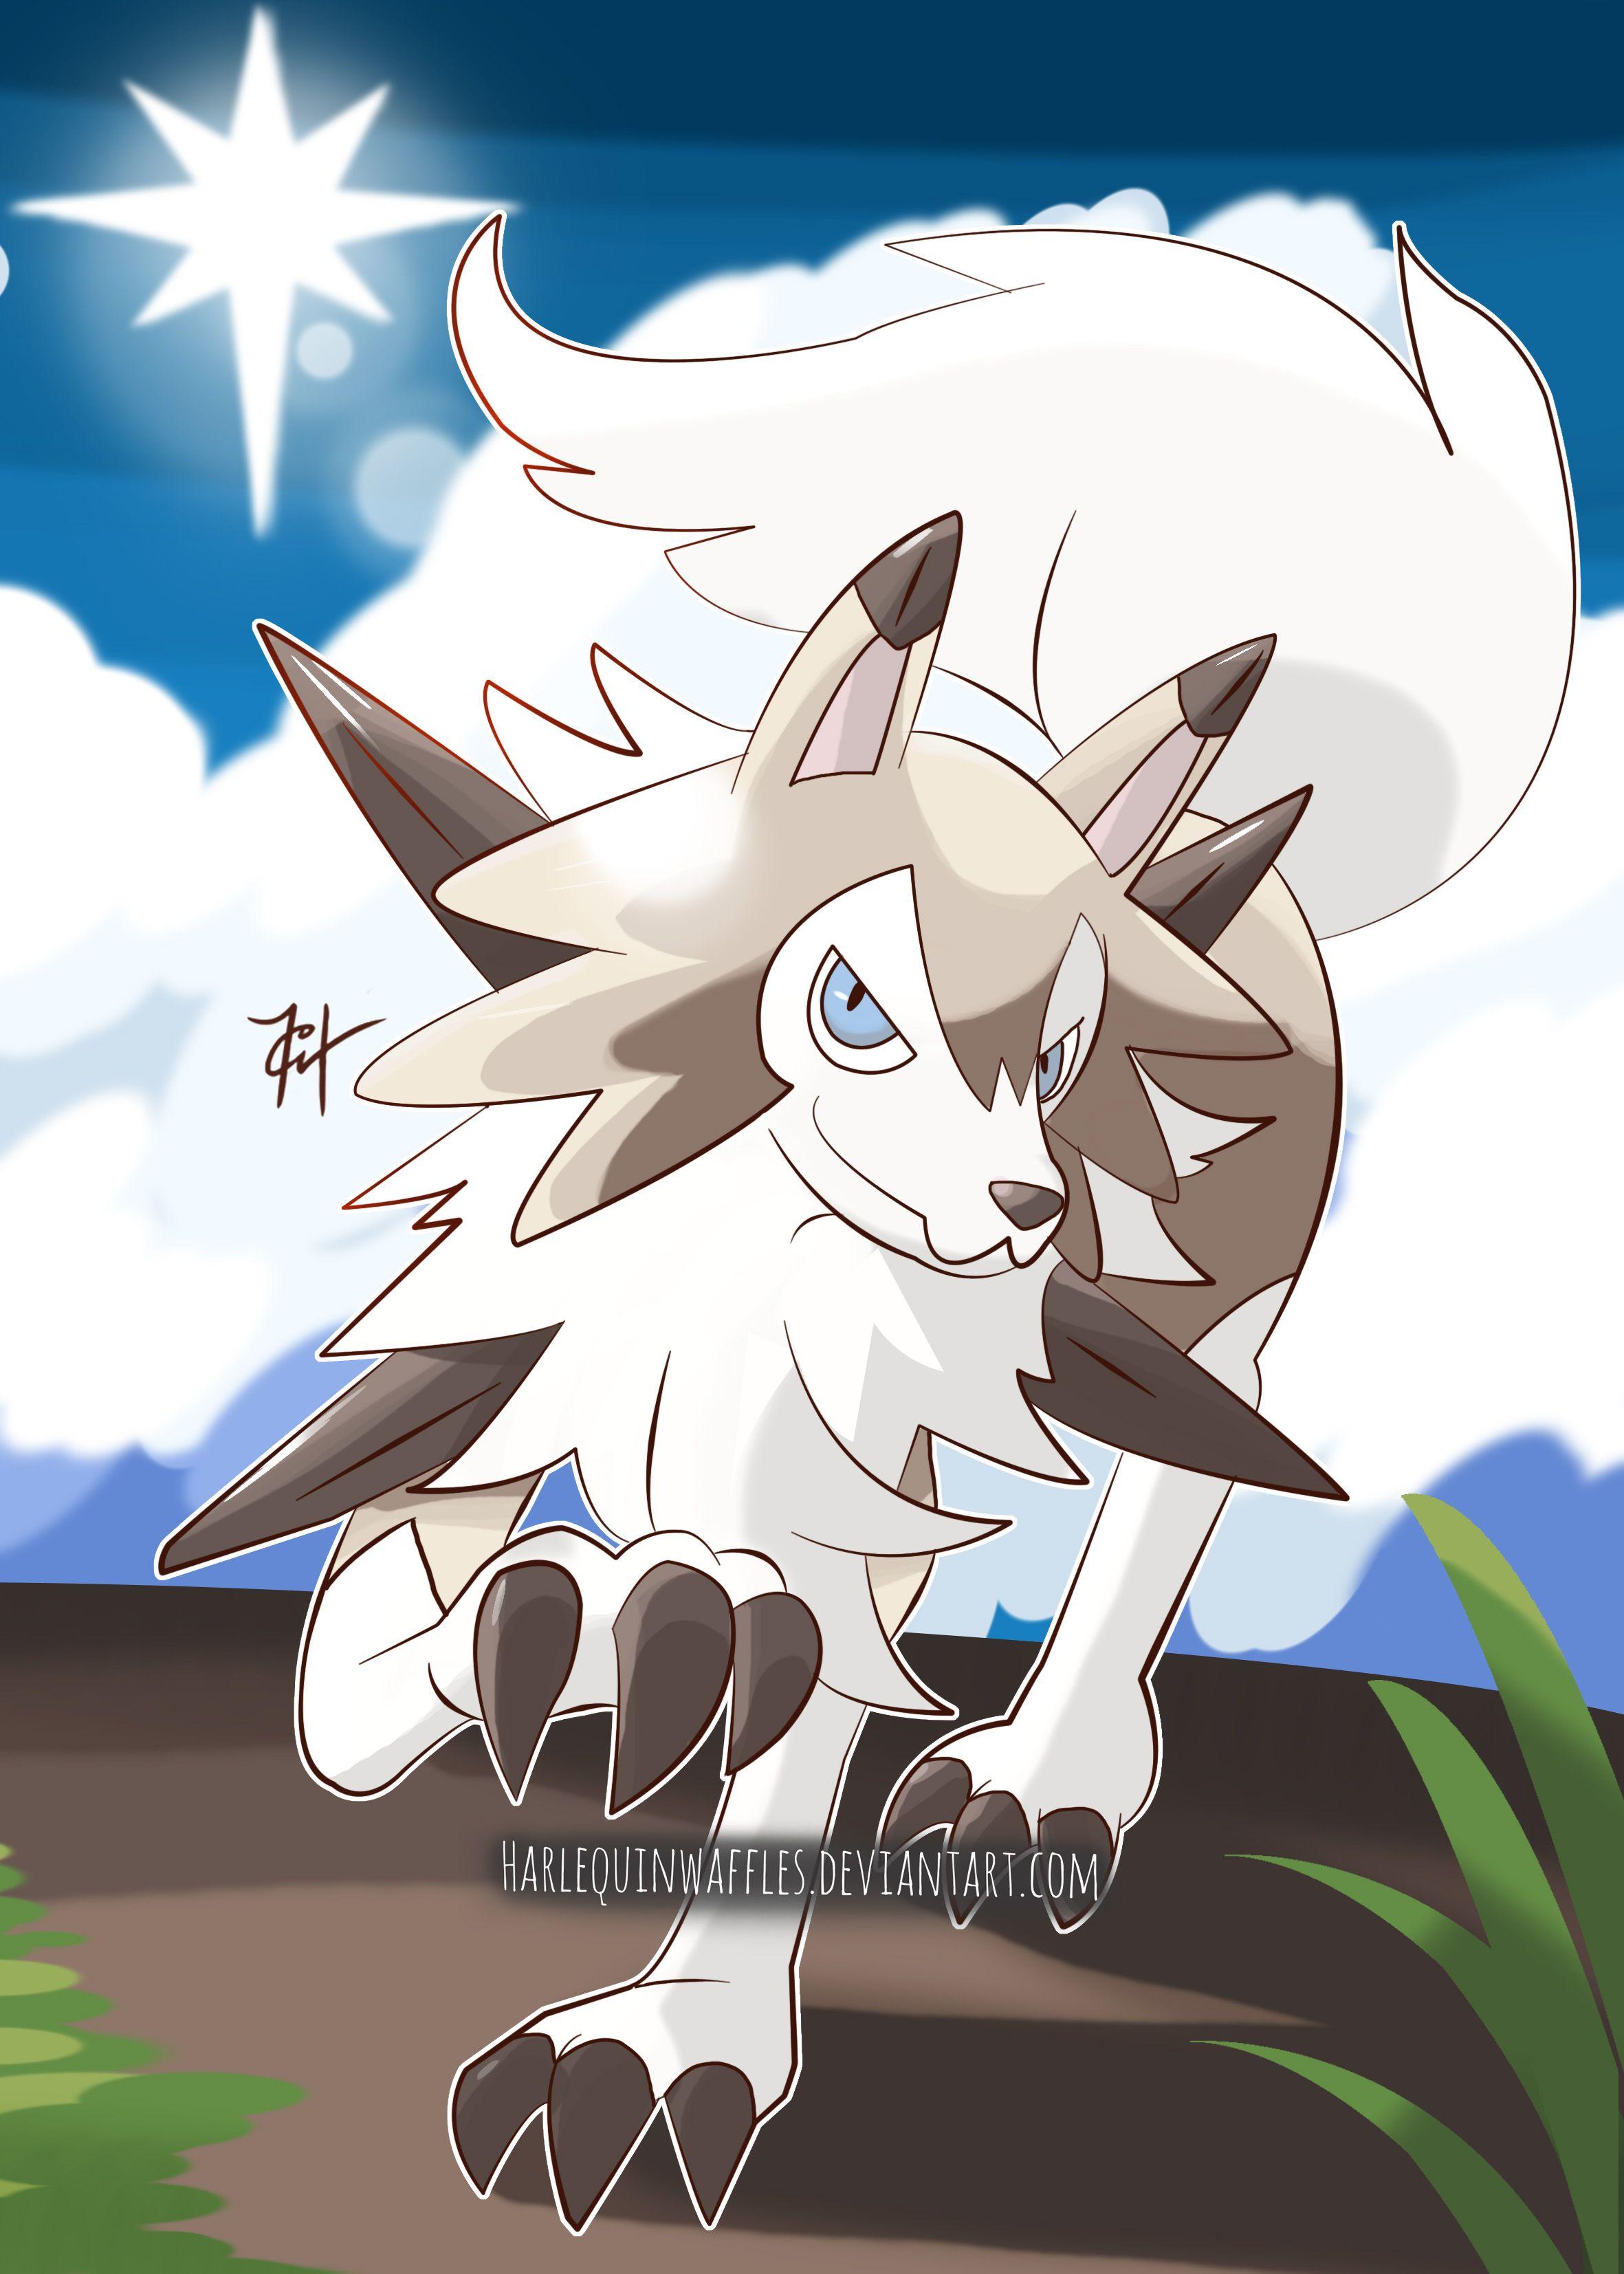 Pin Von Blackrat Auf Pokemon Pinterest Pokémon Pokemon Sonne